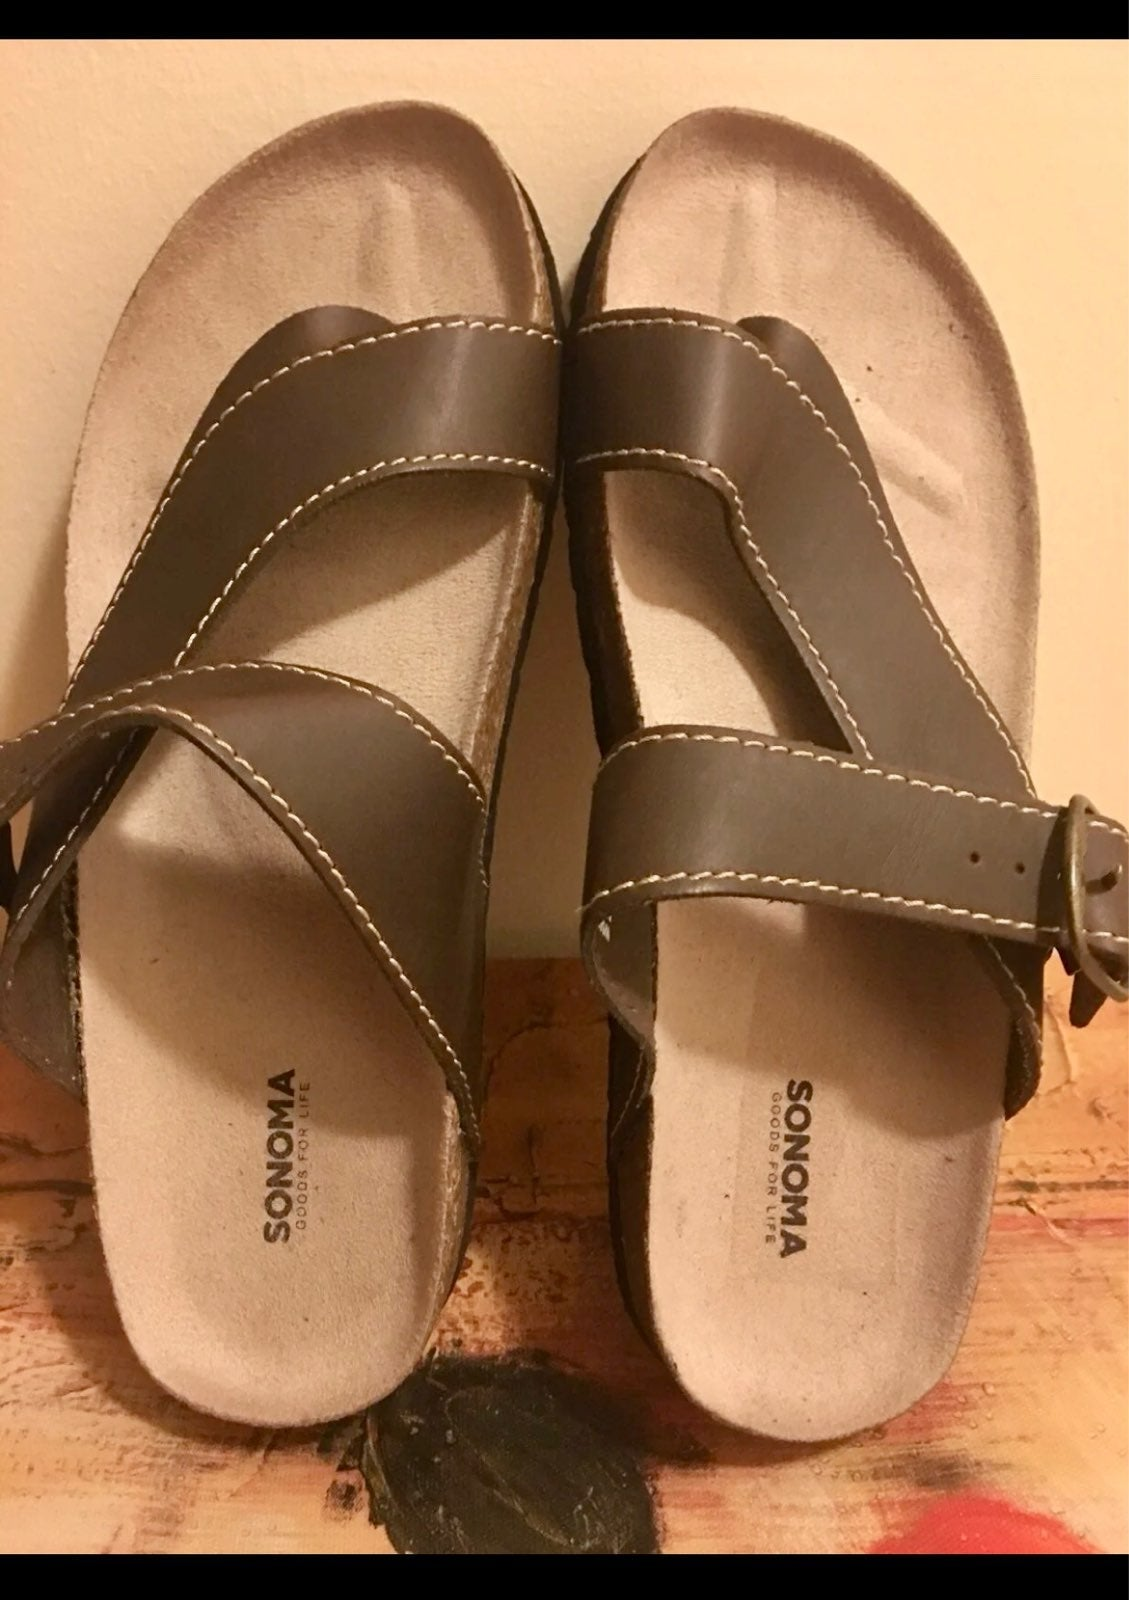 Sonoma Marley Sandals 6